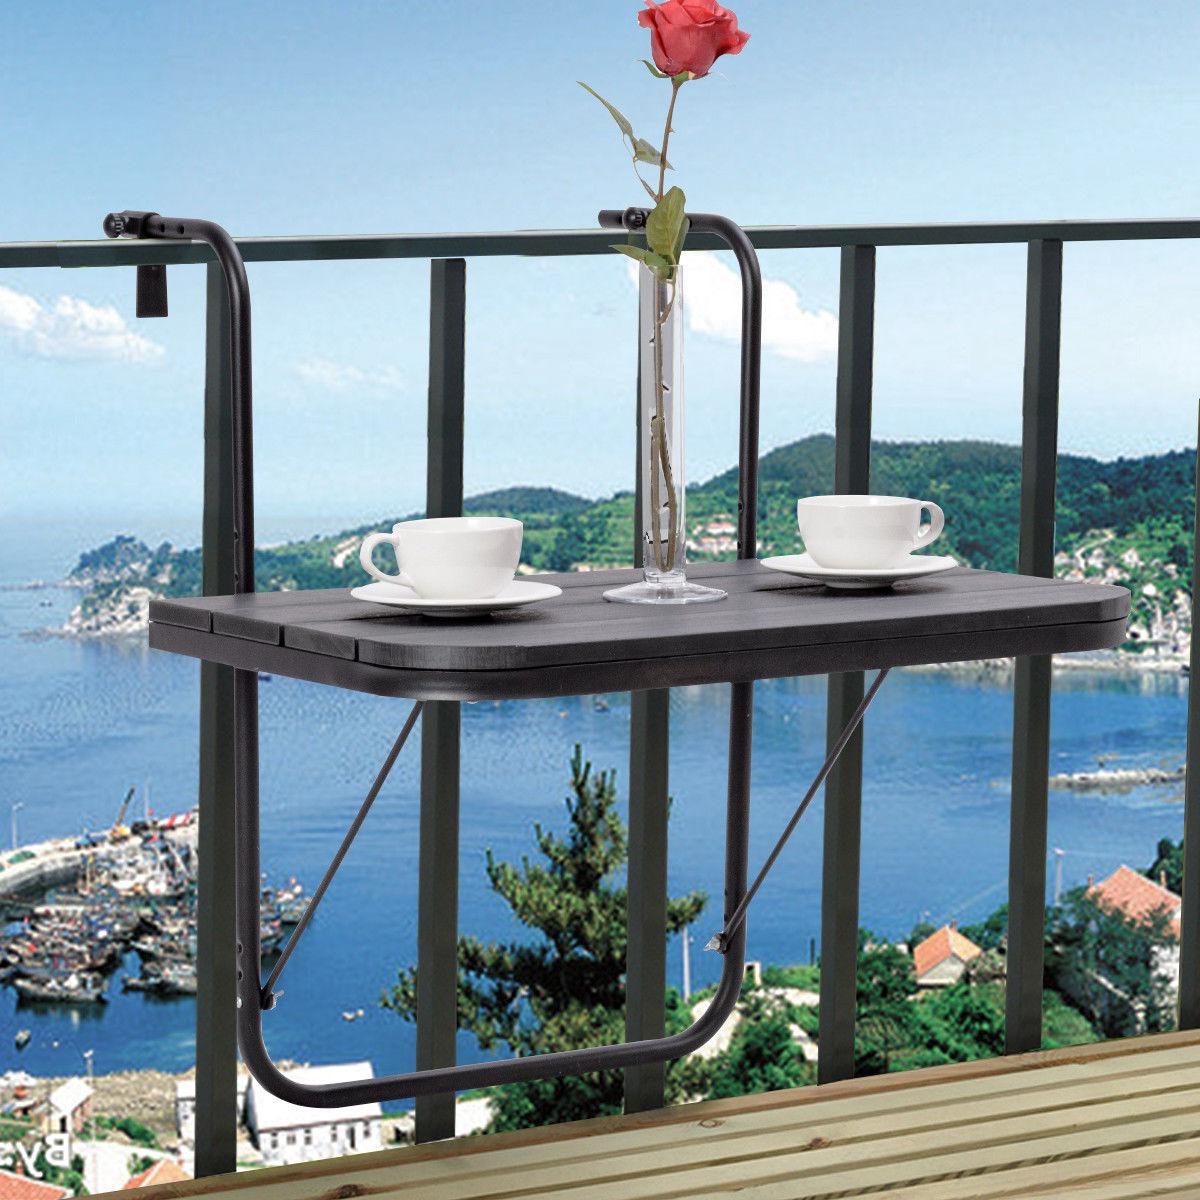 Mesa Balcon Plegable Tqd3 Ajustable Plegable Cubierta Mesa Patio Balcà N Que Sirve De